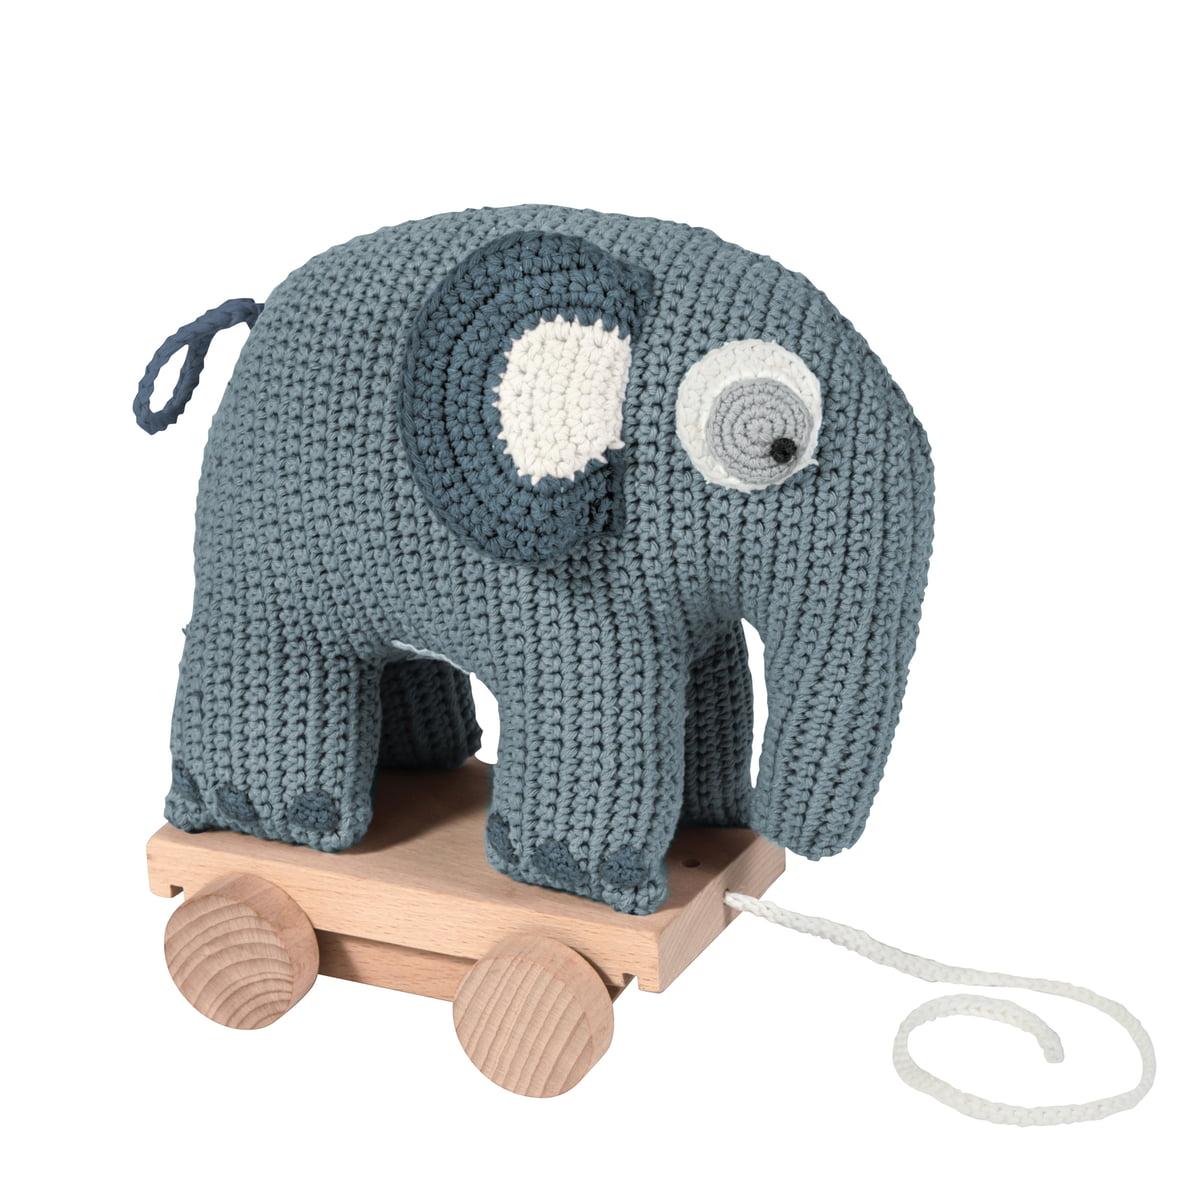 Stuffed Animal Design Jobs